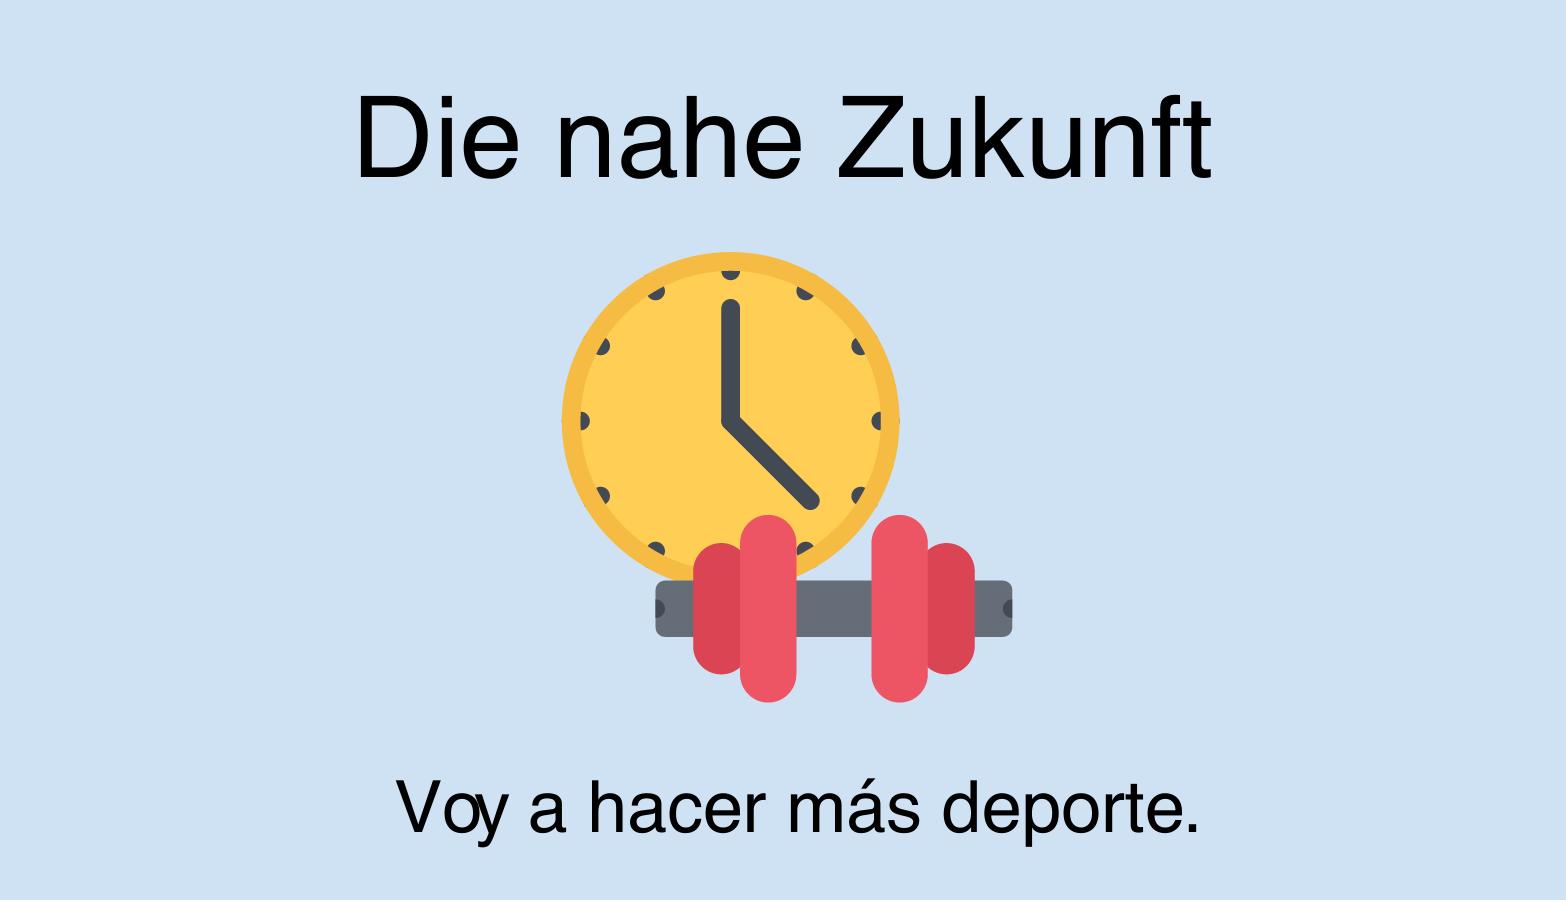 Futuro próximo im Spanischen (ir a + infinitivo)